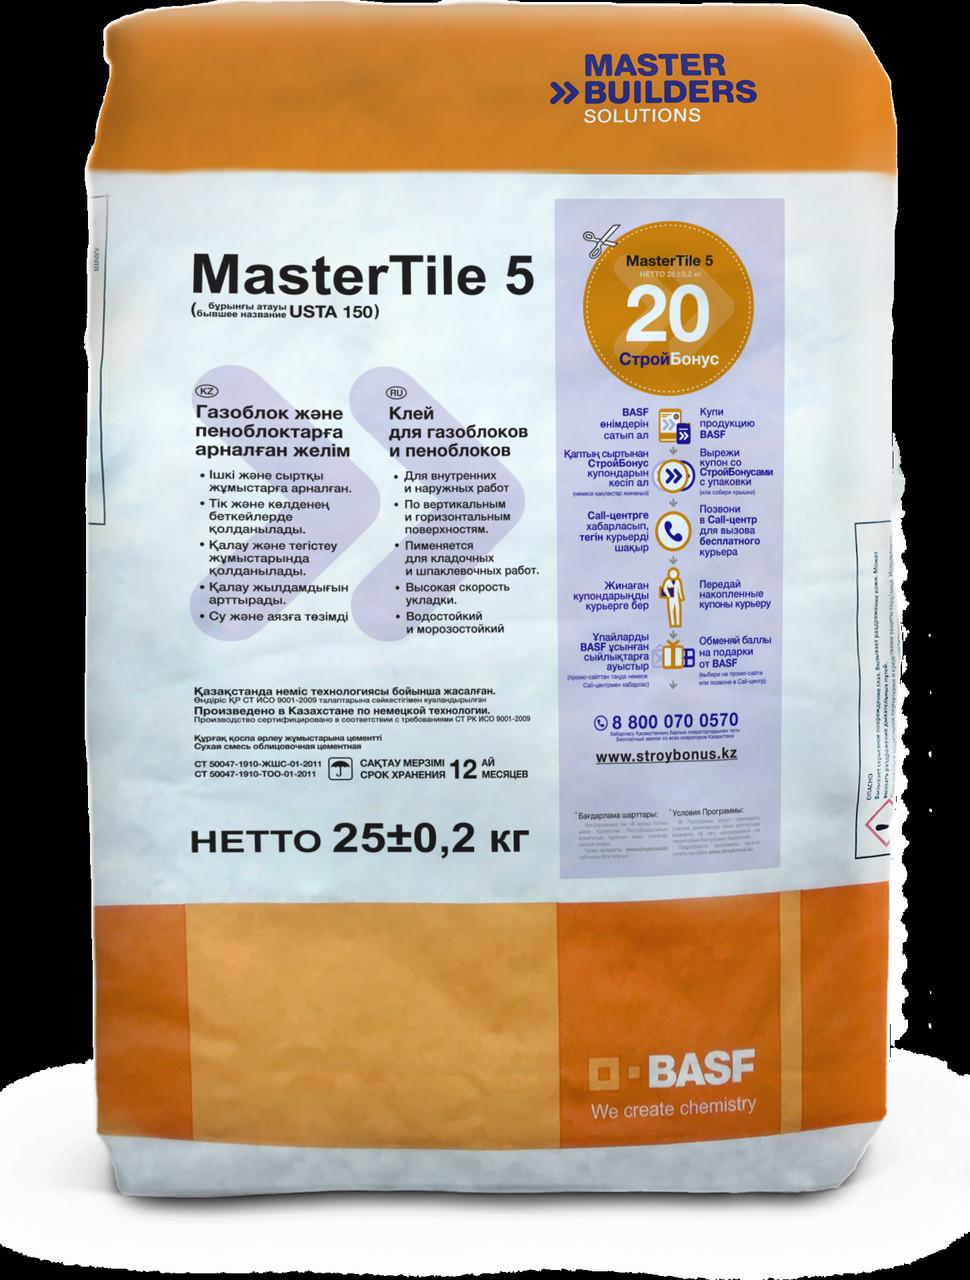 MasterTile 403